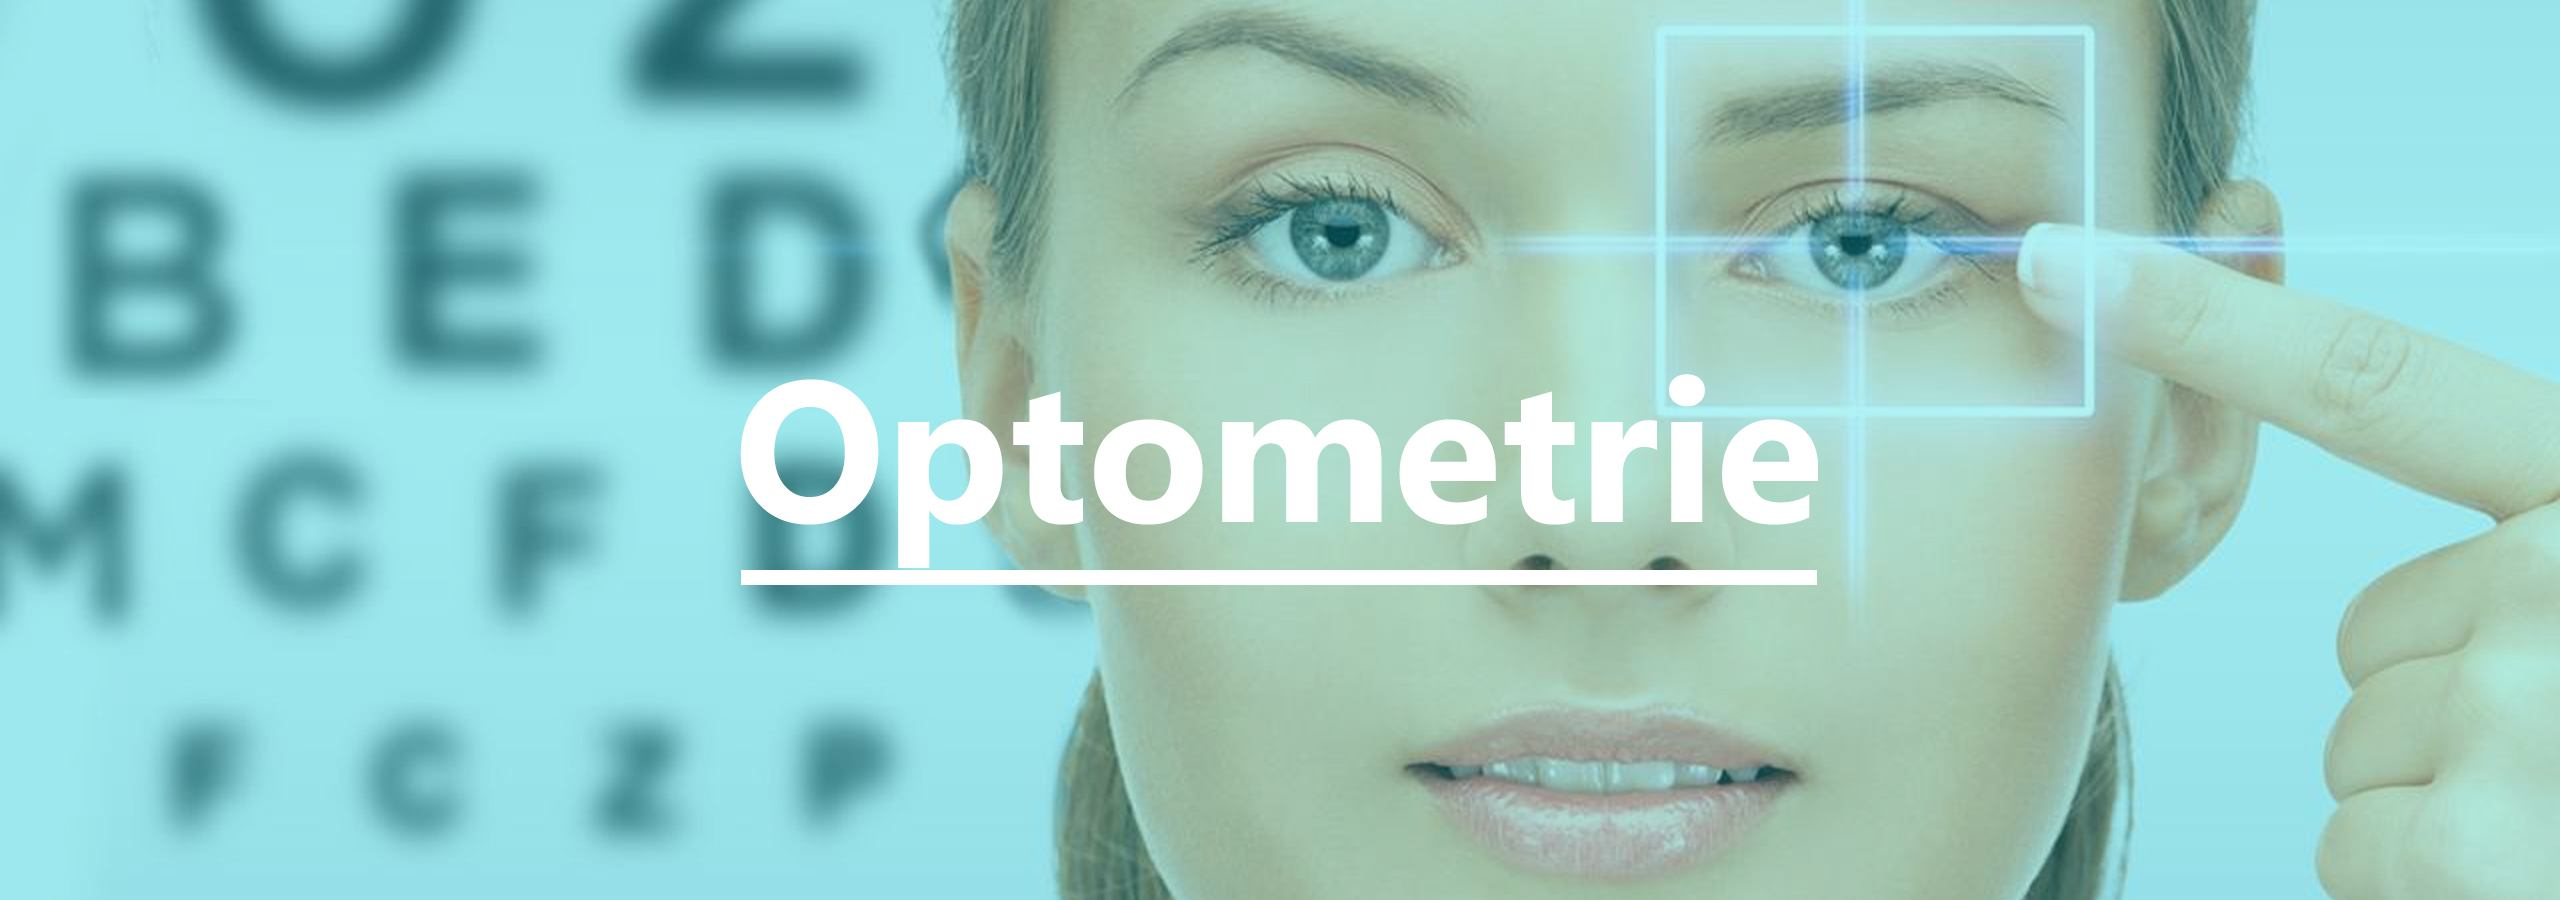 Optometrie bij Sluis Optiek en Optometrie